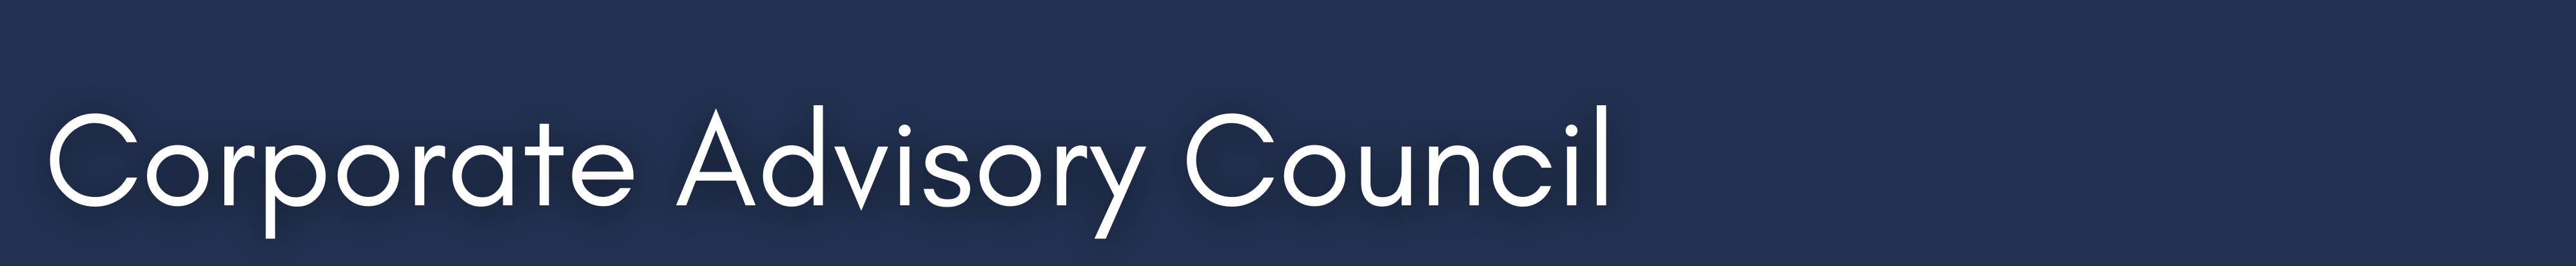 Corporate Advisory Council